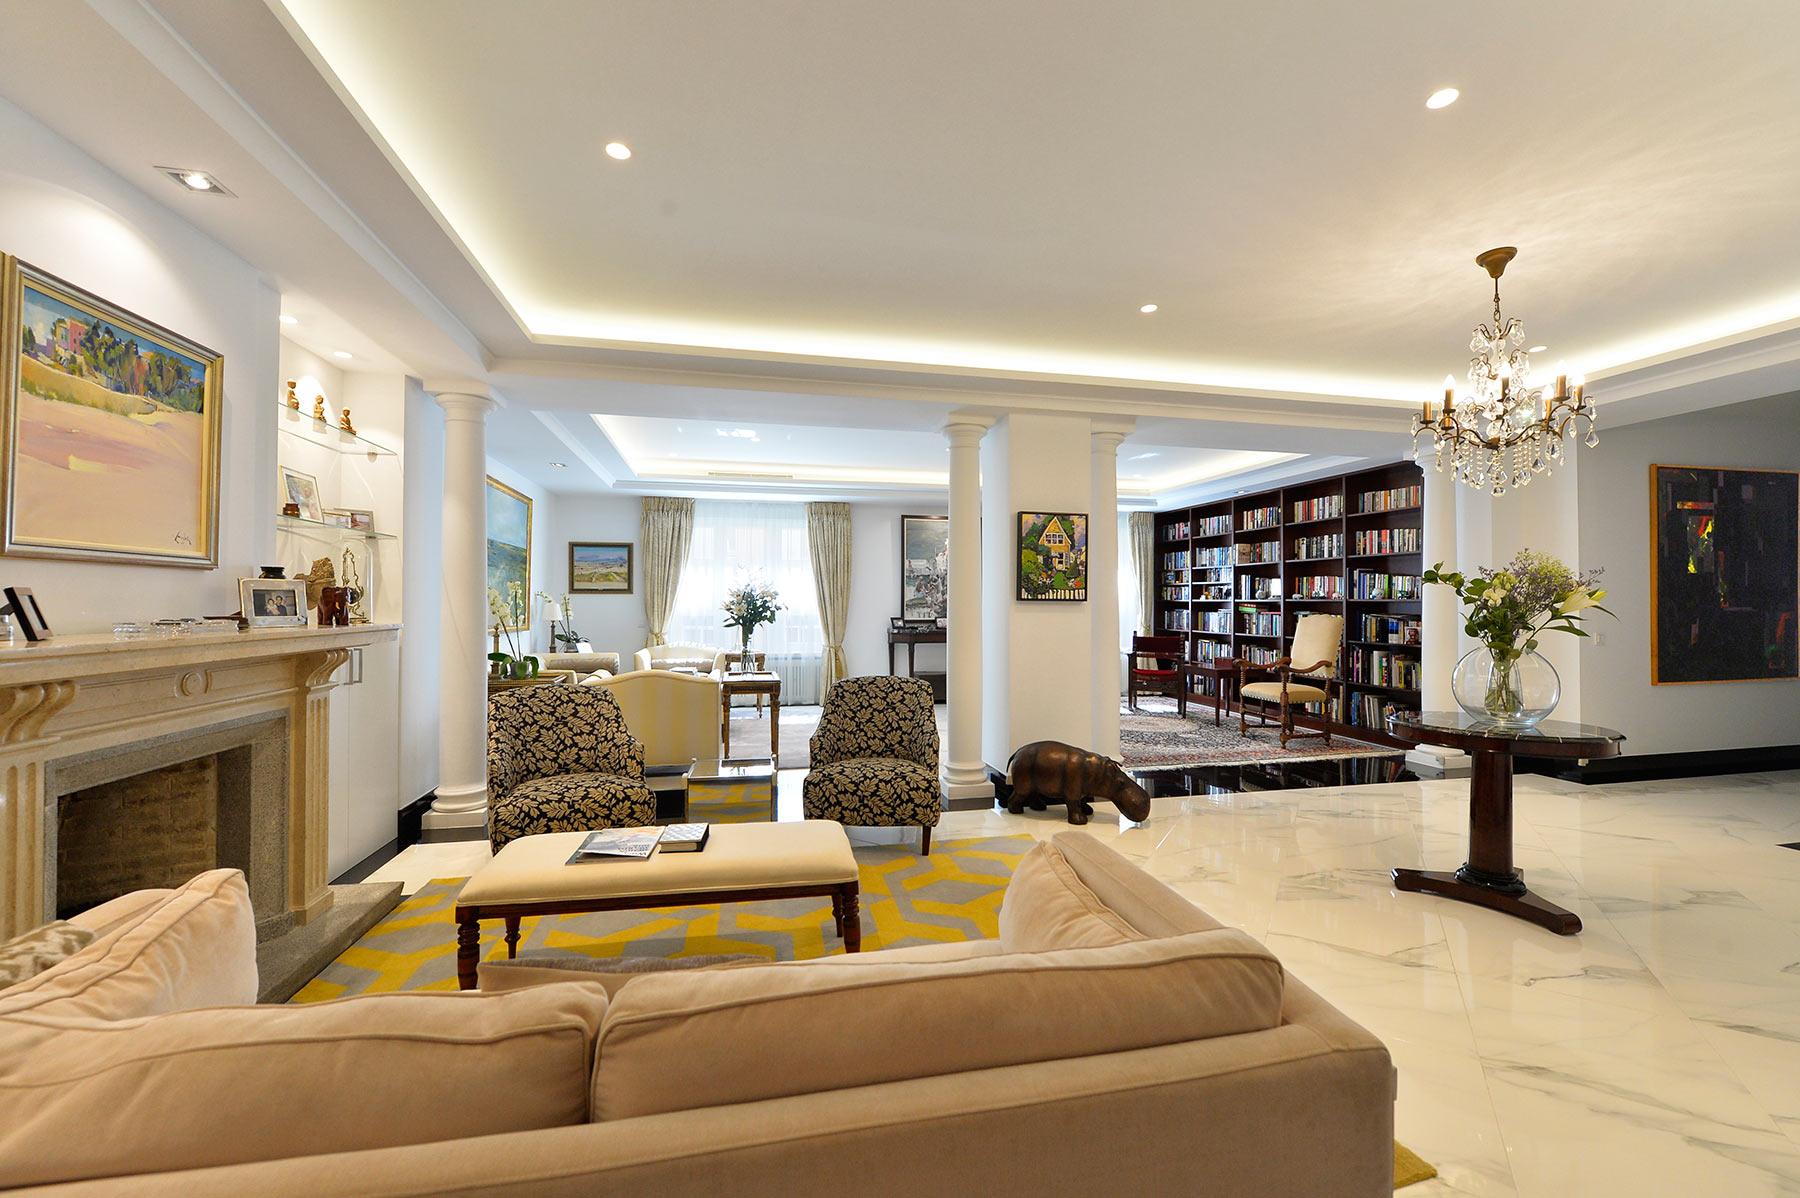 Villa per Vendita alle ore Espectacular piso de 500 metros Nuñez de Balboa Madrid, Madrid, 28001 Spagna